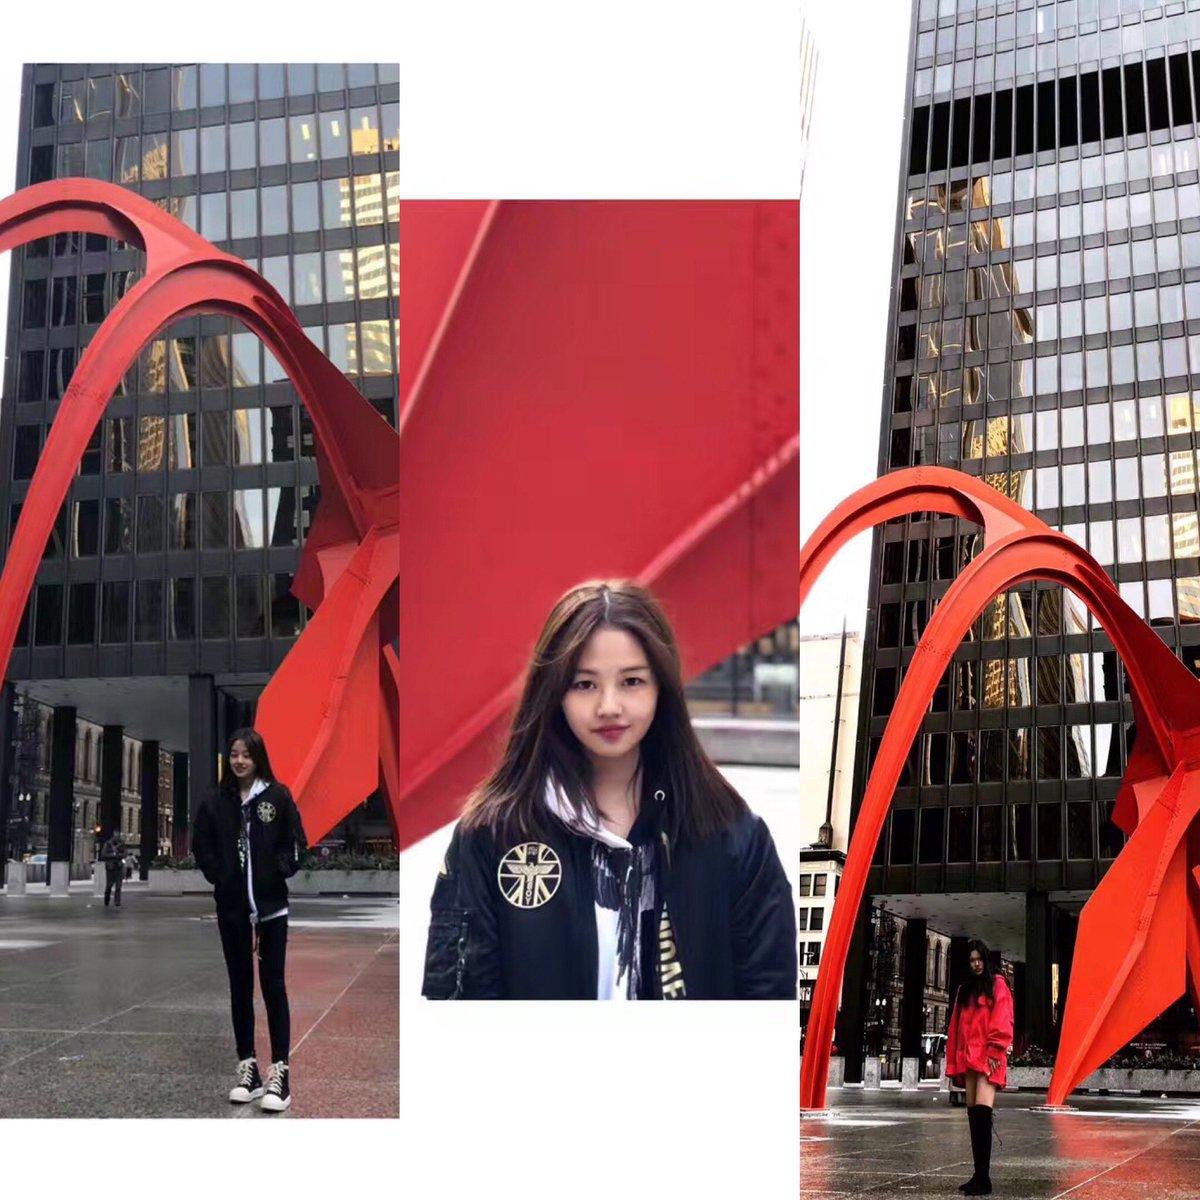 #AmerigoEdu #AmerigoChi #studentphotos #exploringchicago #chicagolove https://t.co/7G3Dv1UnKI